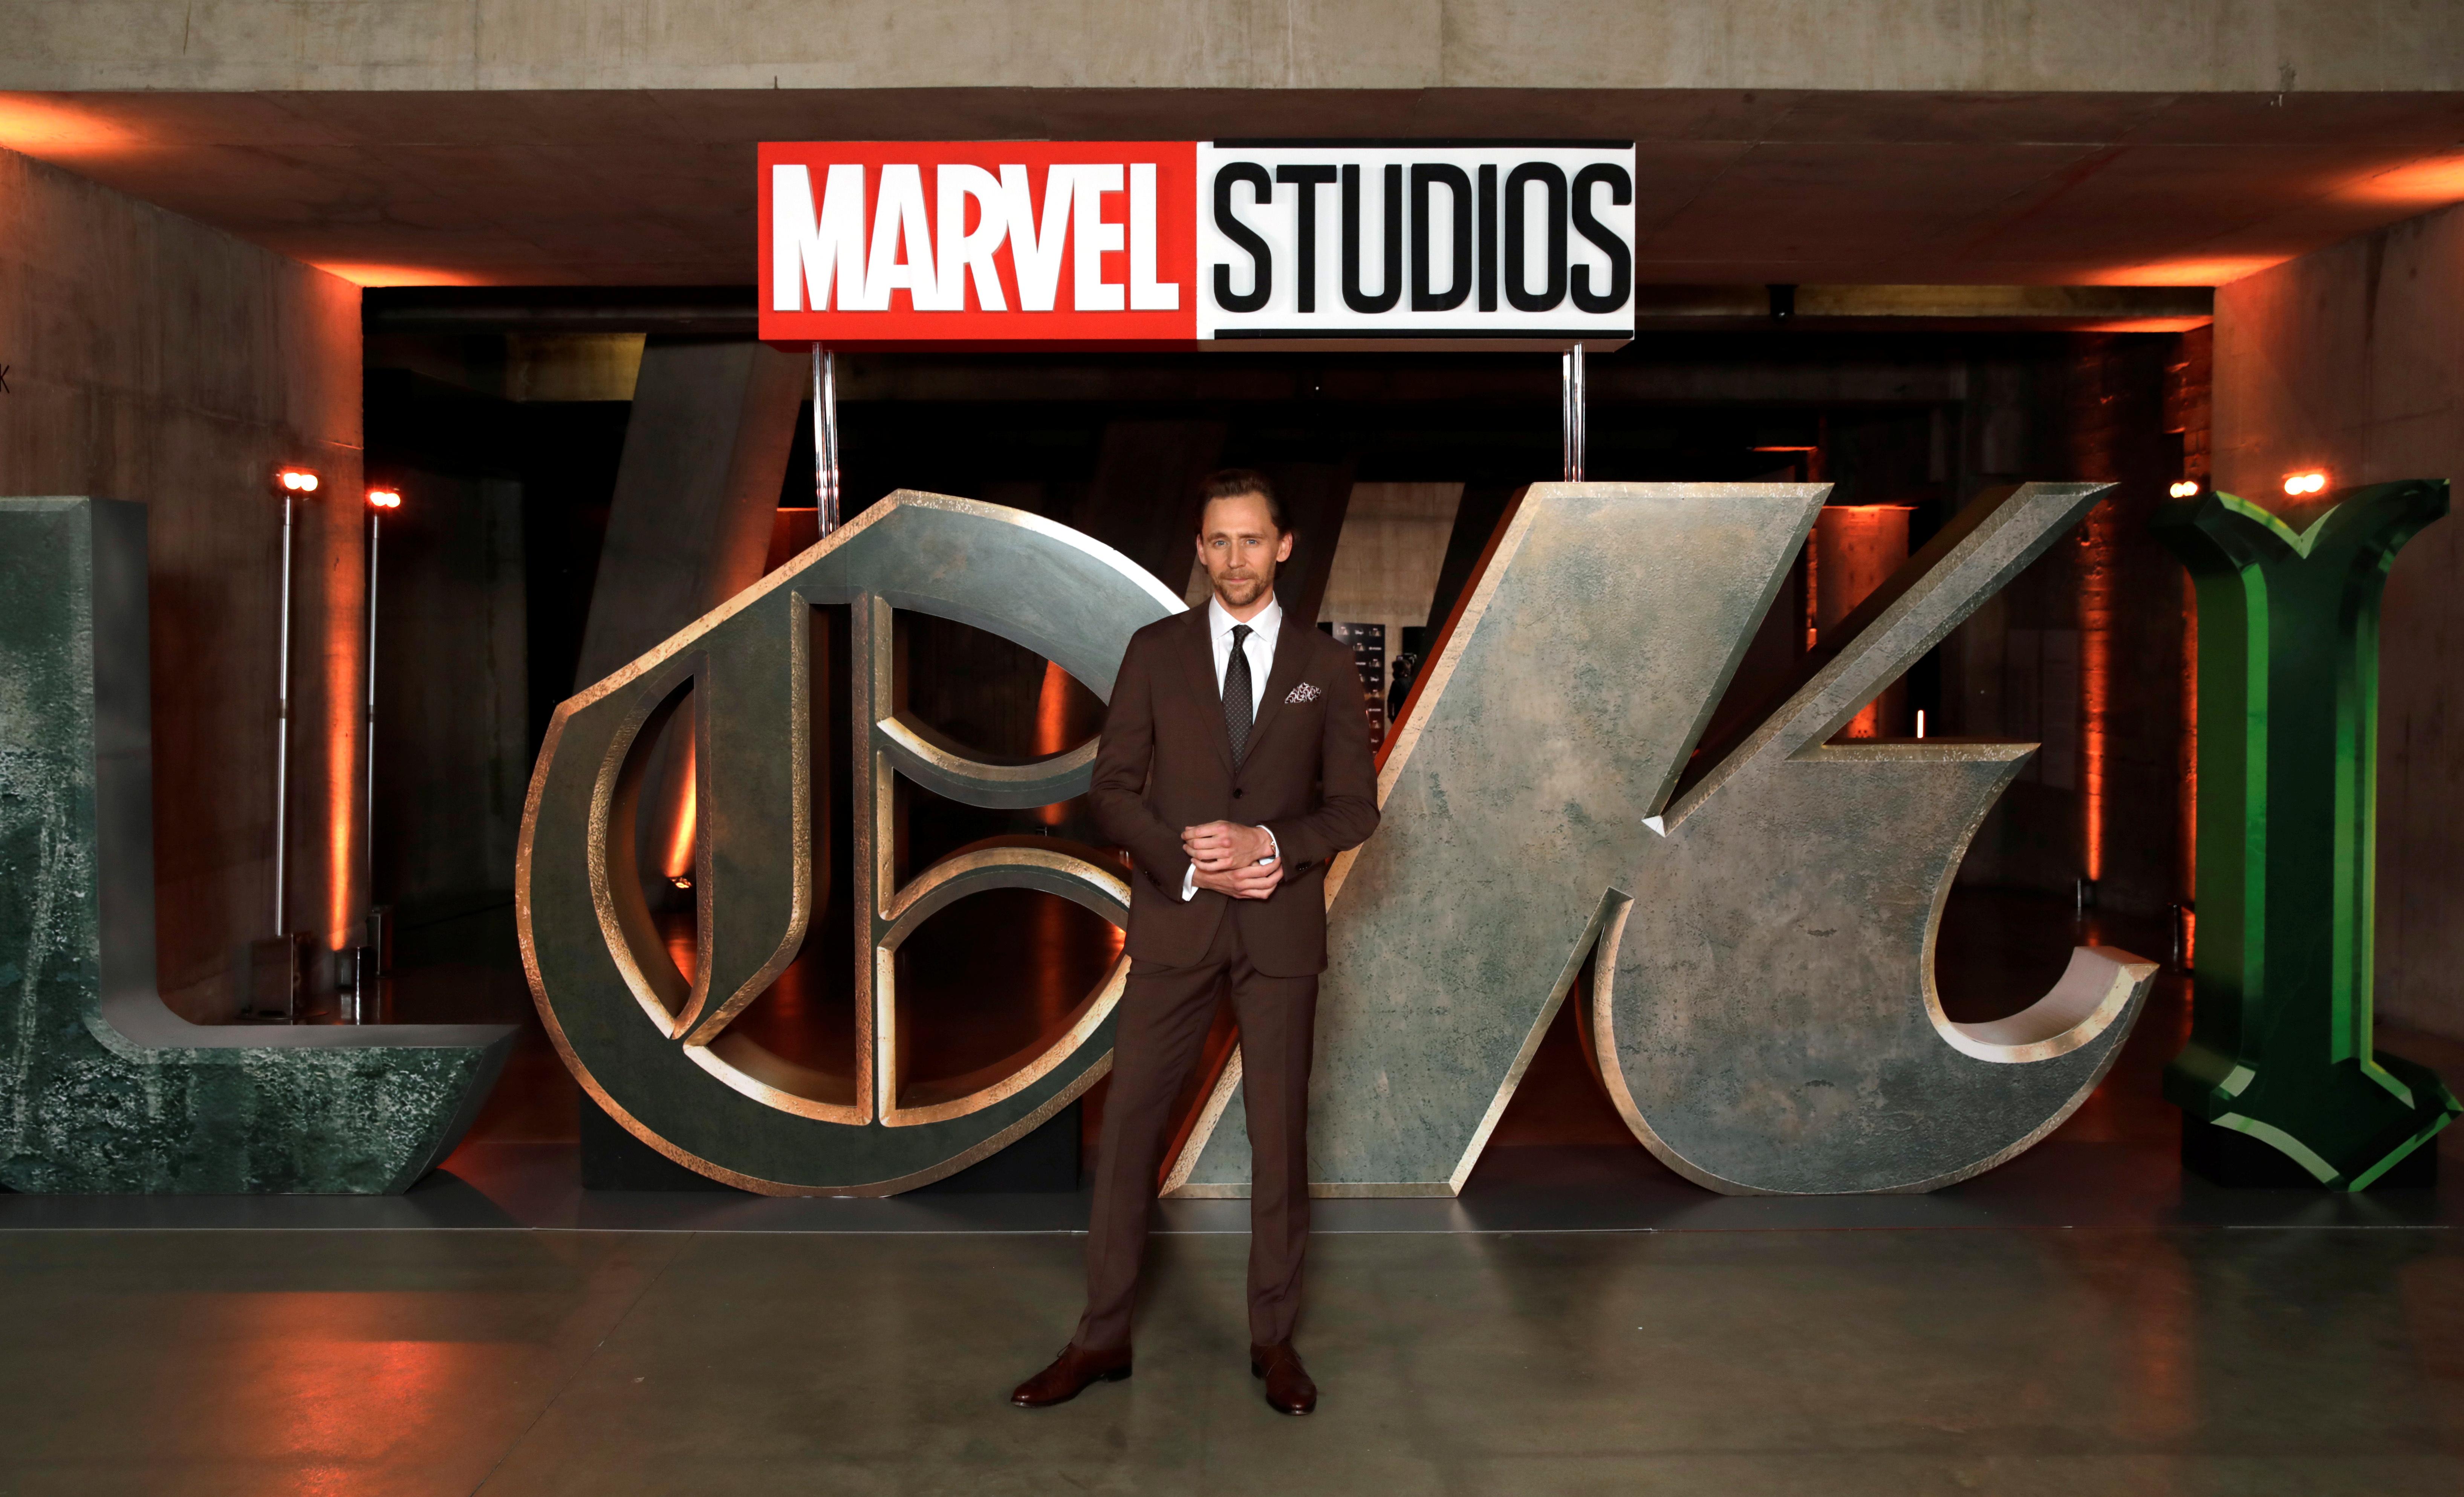 Tom Hiddleston attends the Special Screening of Marvel Studios' series